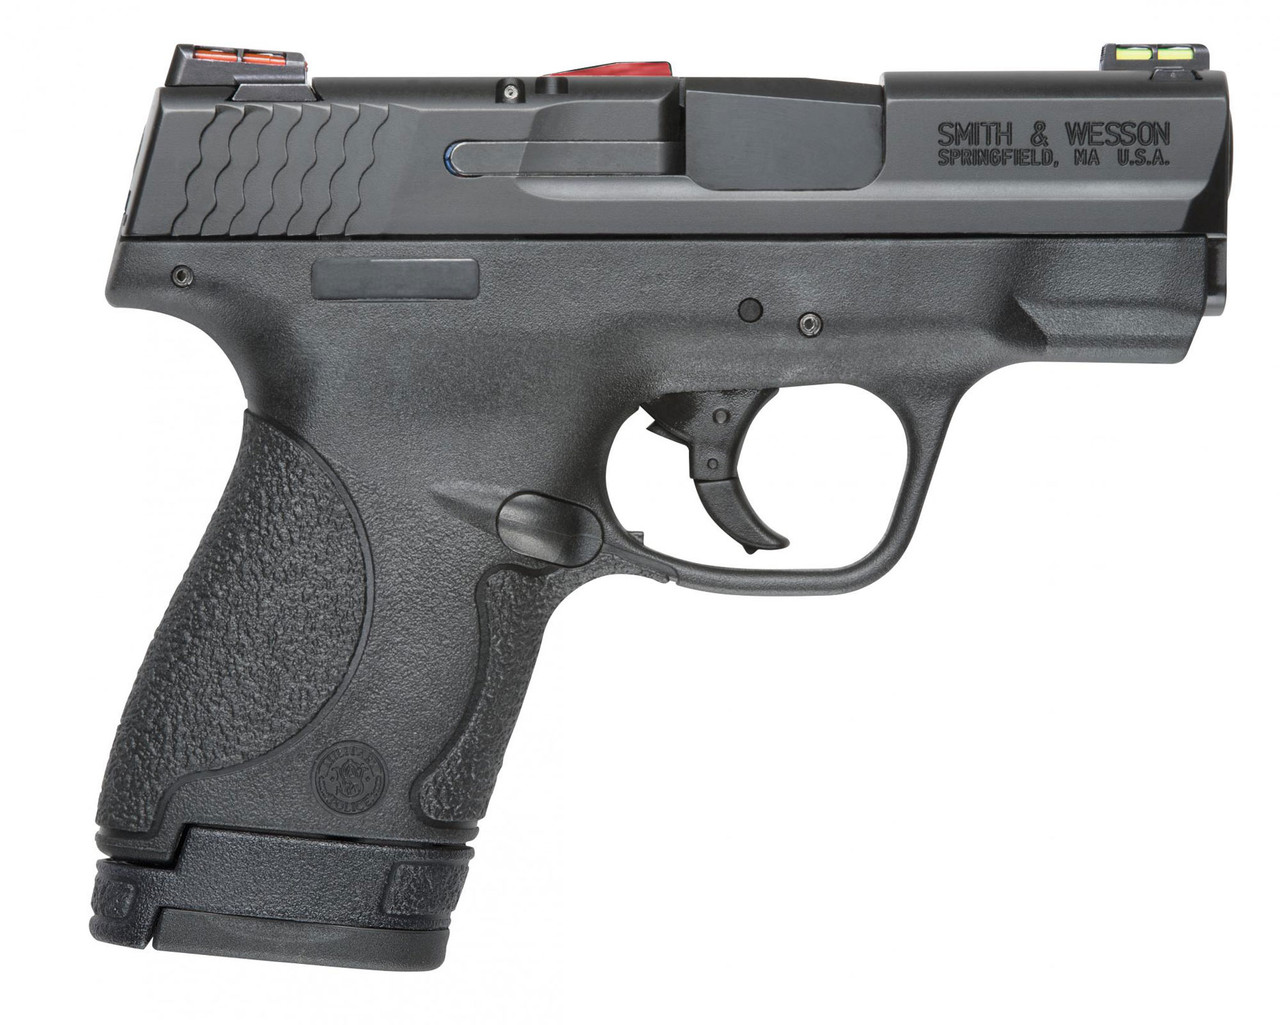 "Smith & Wesson M&P 9 Shield 3.1"" CALIFORNIA LEGAL - 9mm"